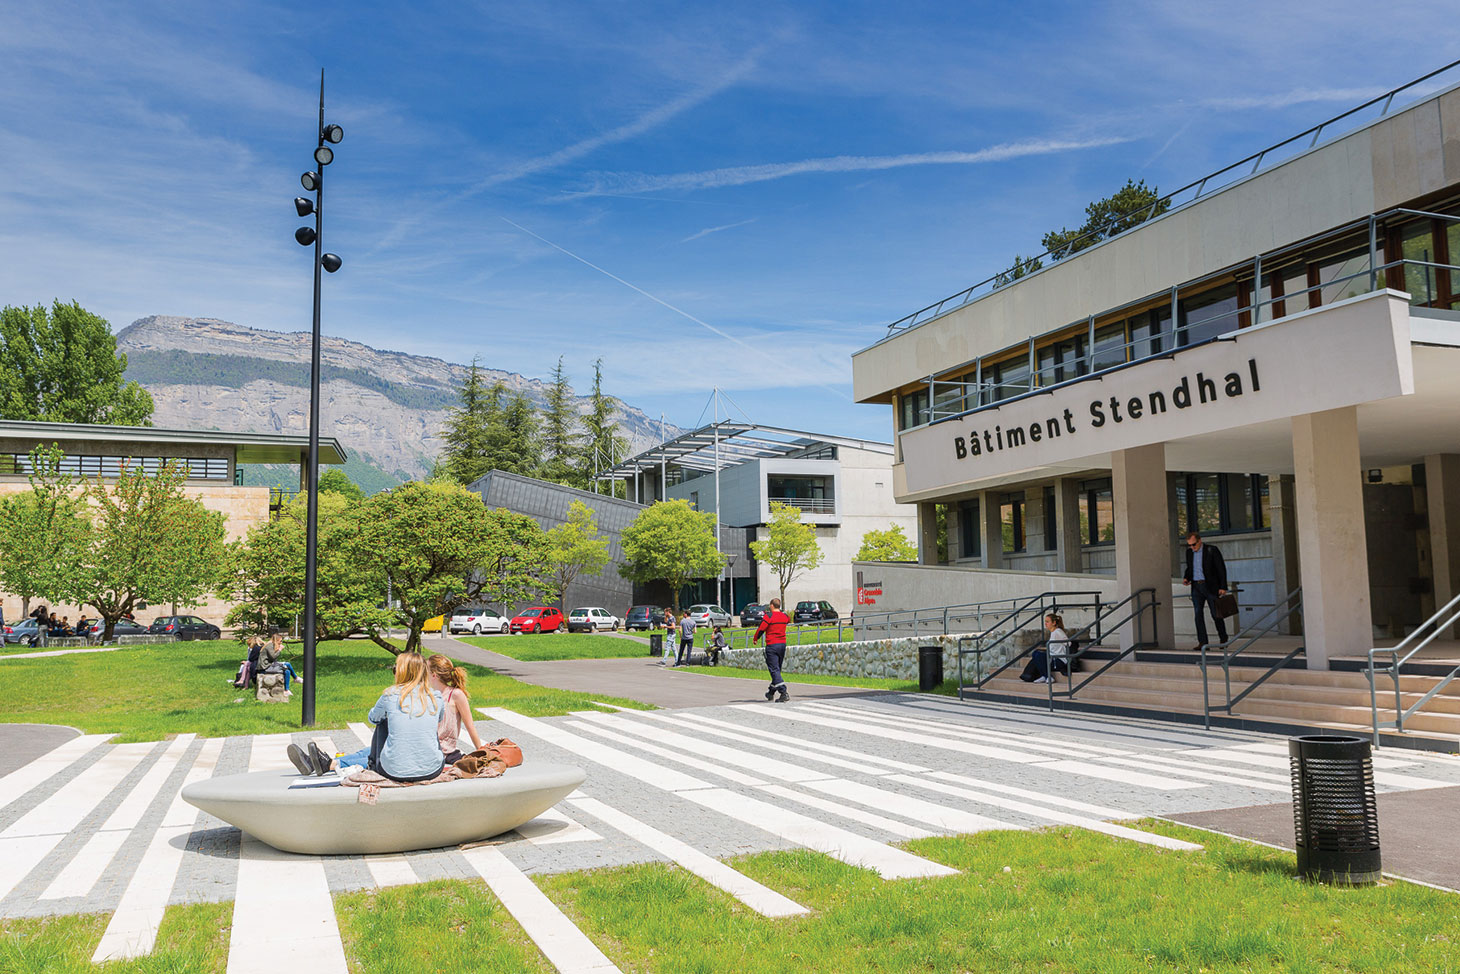 Le campus universitaire de Grenoble